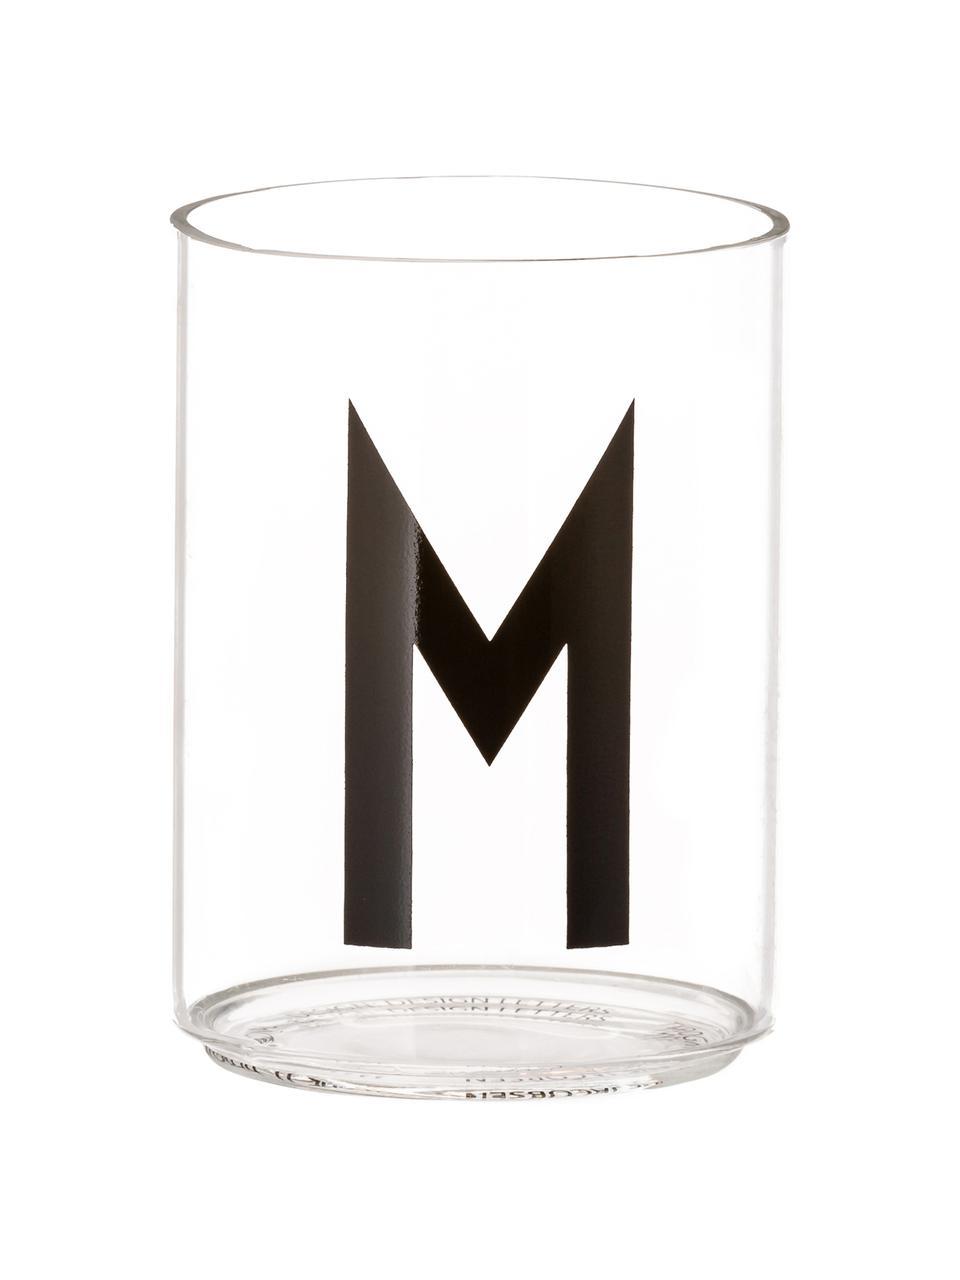 Design waterglas Personal met letters (varianten van A tot Z), Borosilicaatglas, Transparant, zwart, Waterglas M